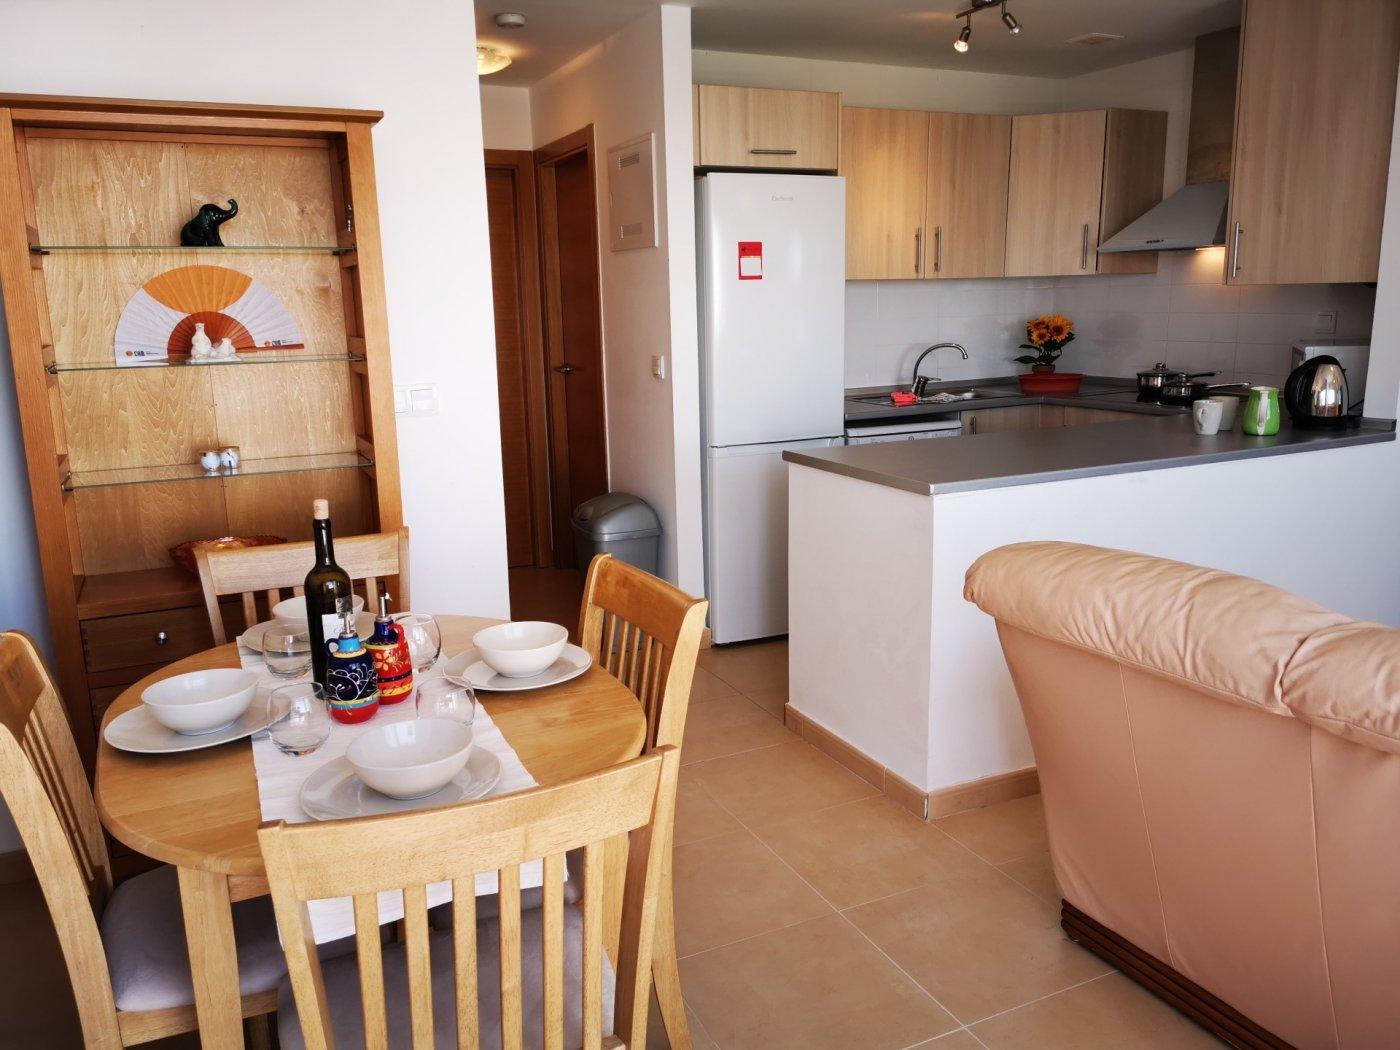 Gallery Image 5 of Key-Ready 2 Bedroom Apartment Overlooking the Citrus Groves in Jardin 10, Condado de Alhama